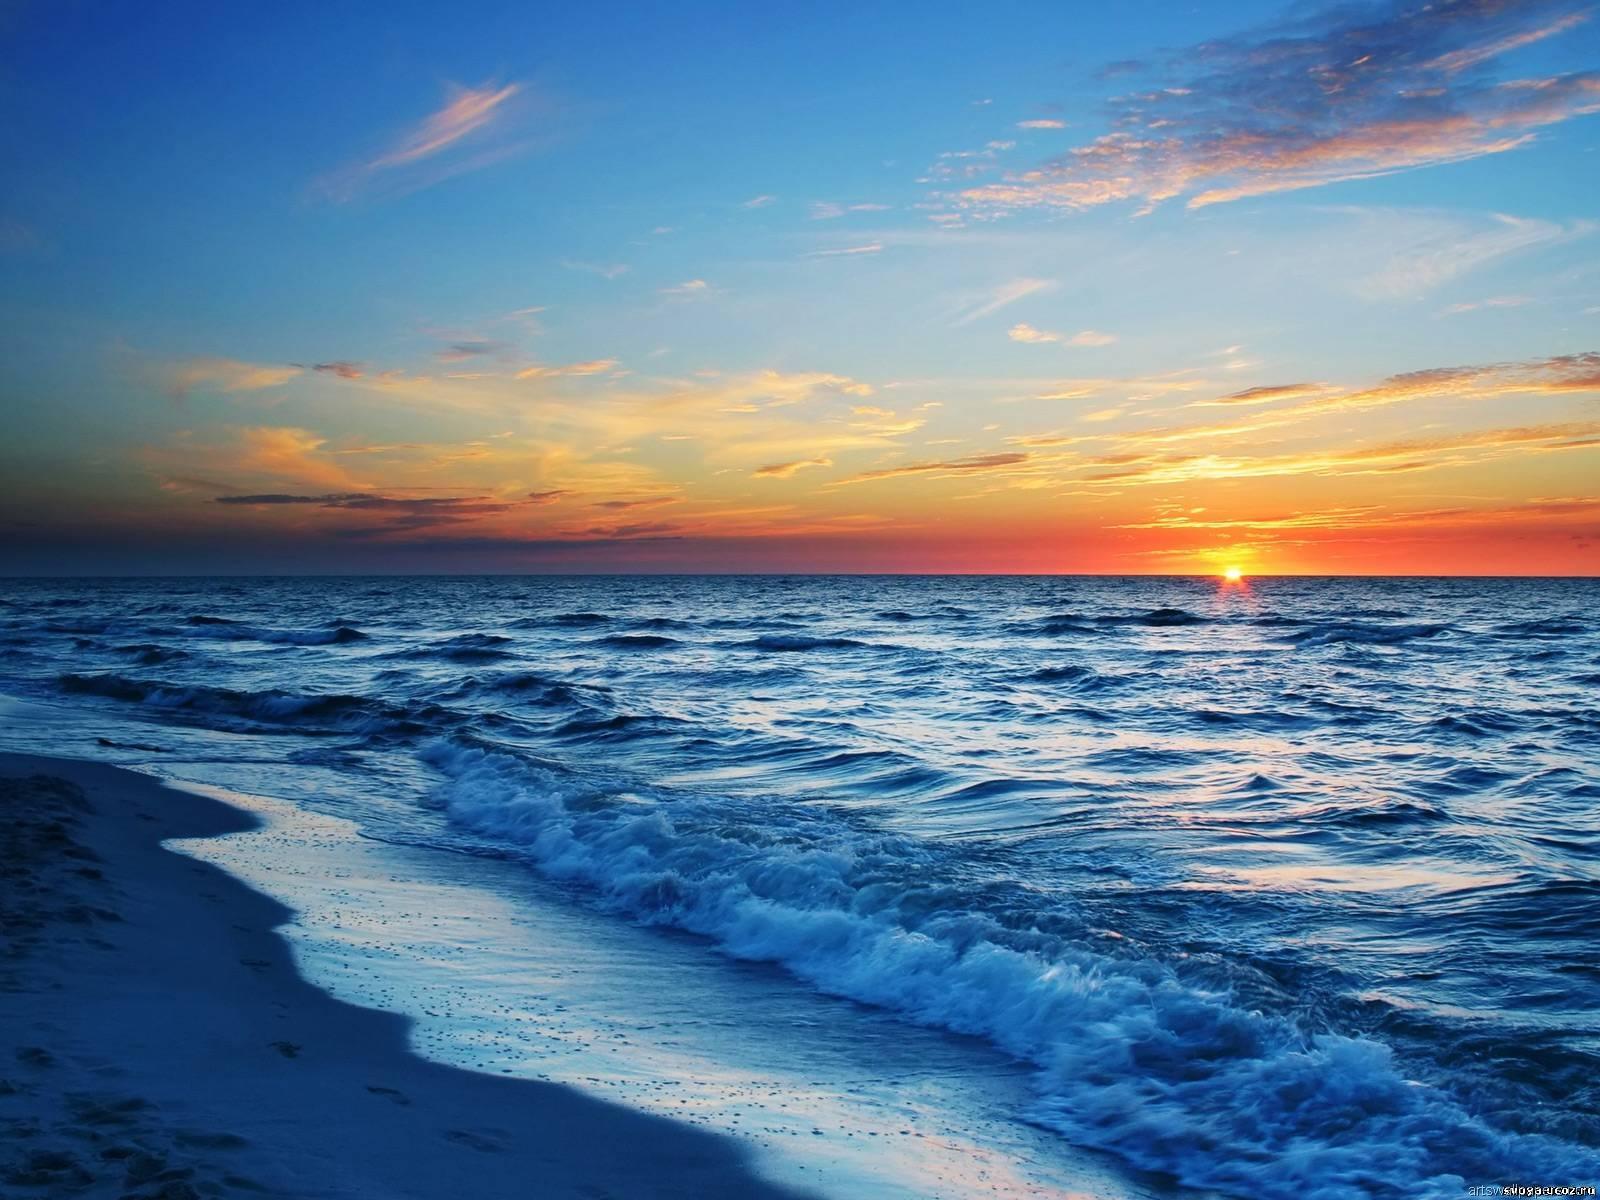 Sea Ocean Wallpaper HD Full HD 1080p Desktop Wallpaper Background 1600x1200